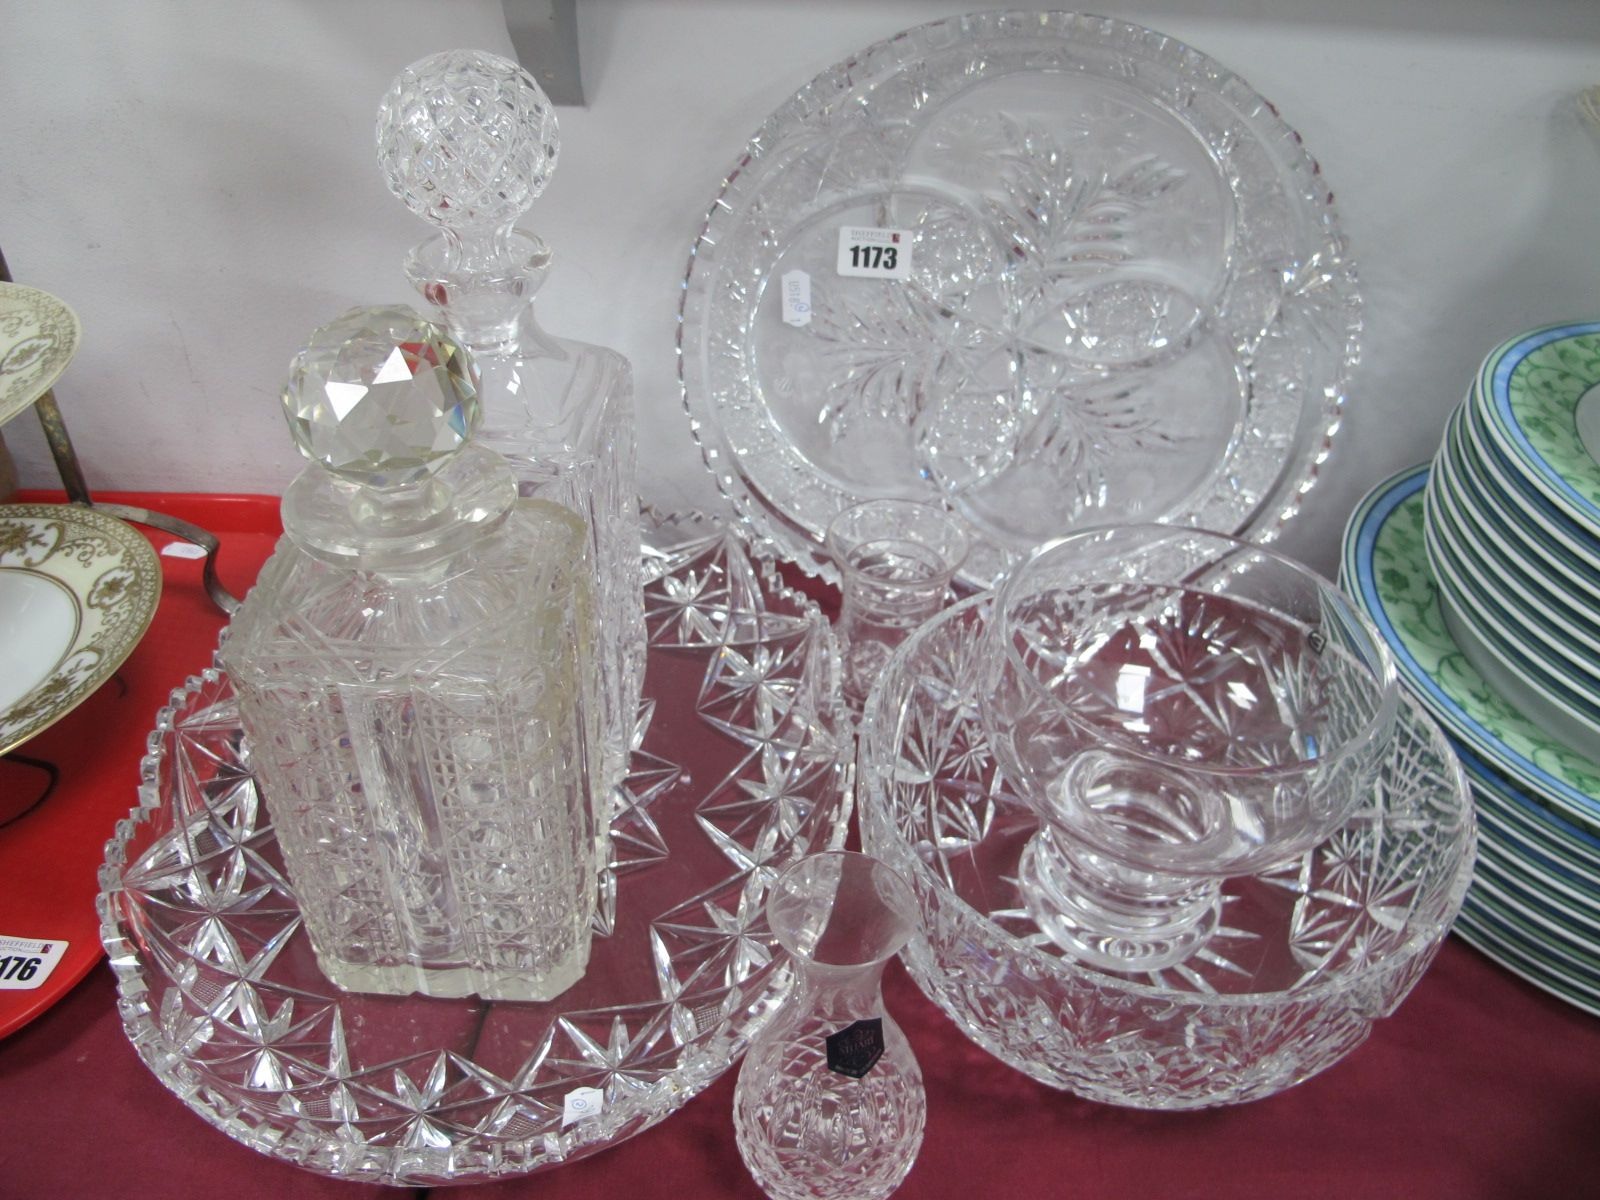 Two Cut Glass Platters, two decanters, Dartington, Stuart, other glassware.